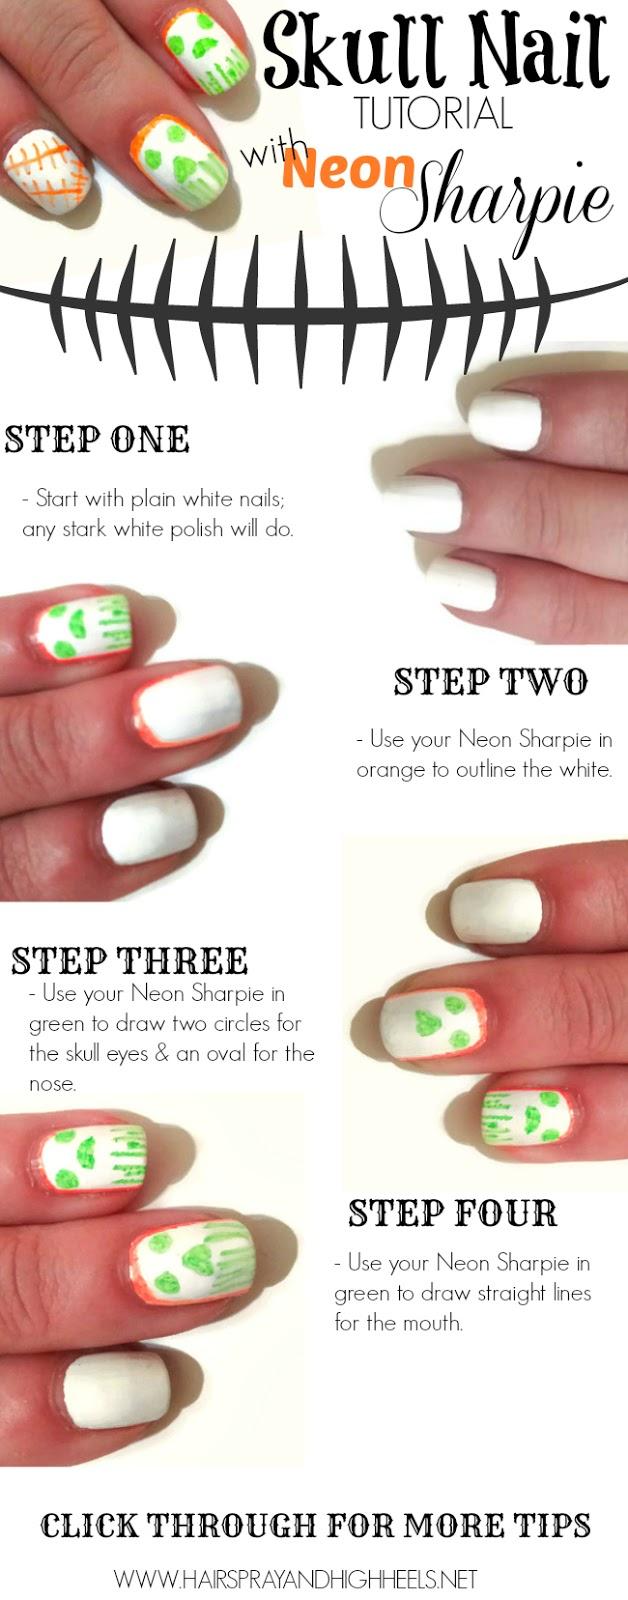 Sharpie Manicure